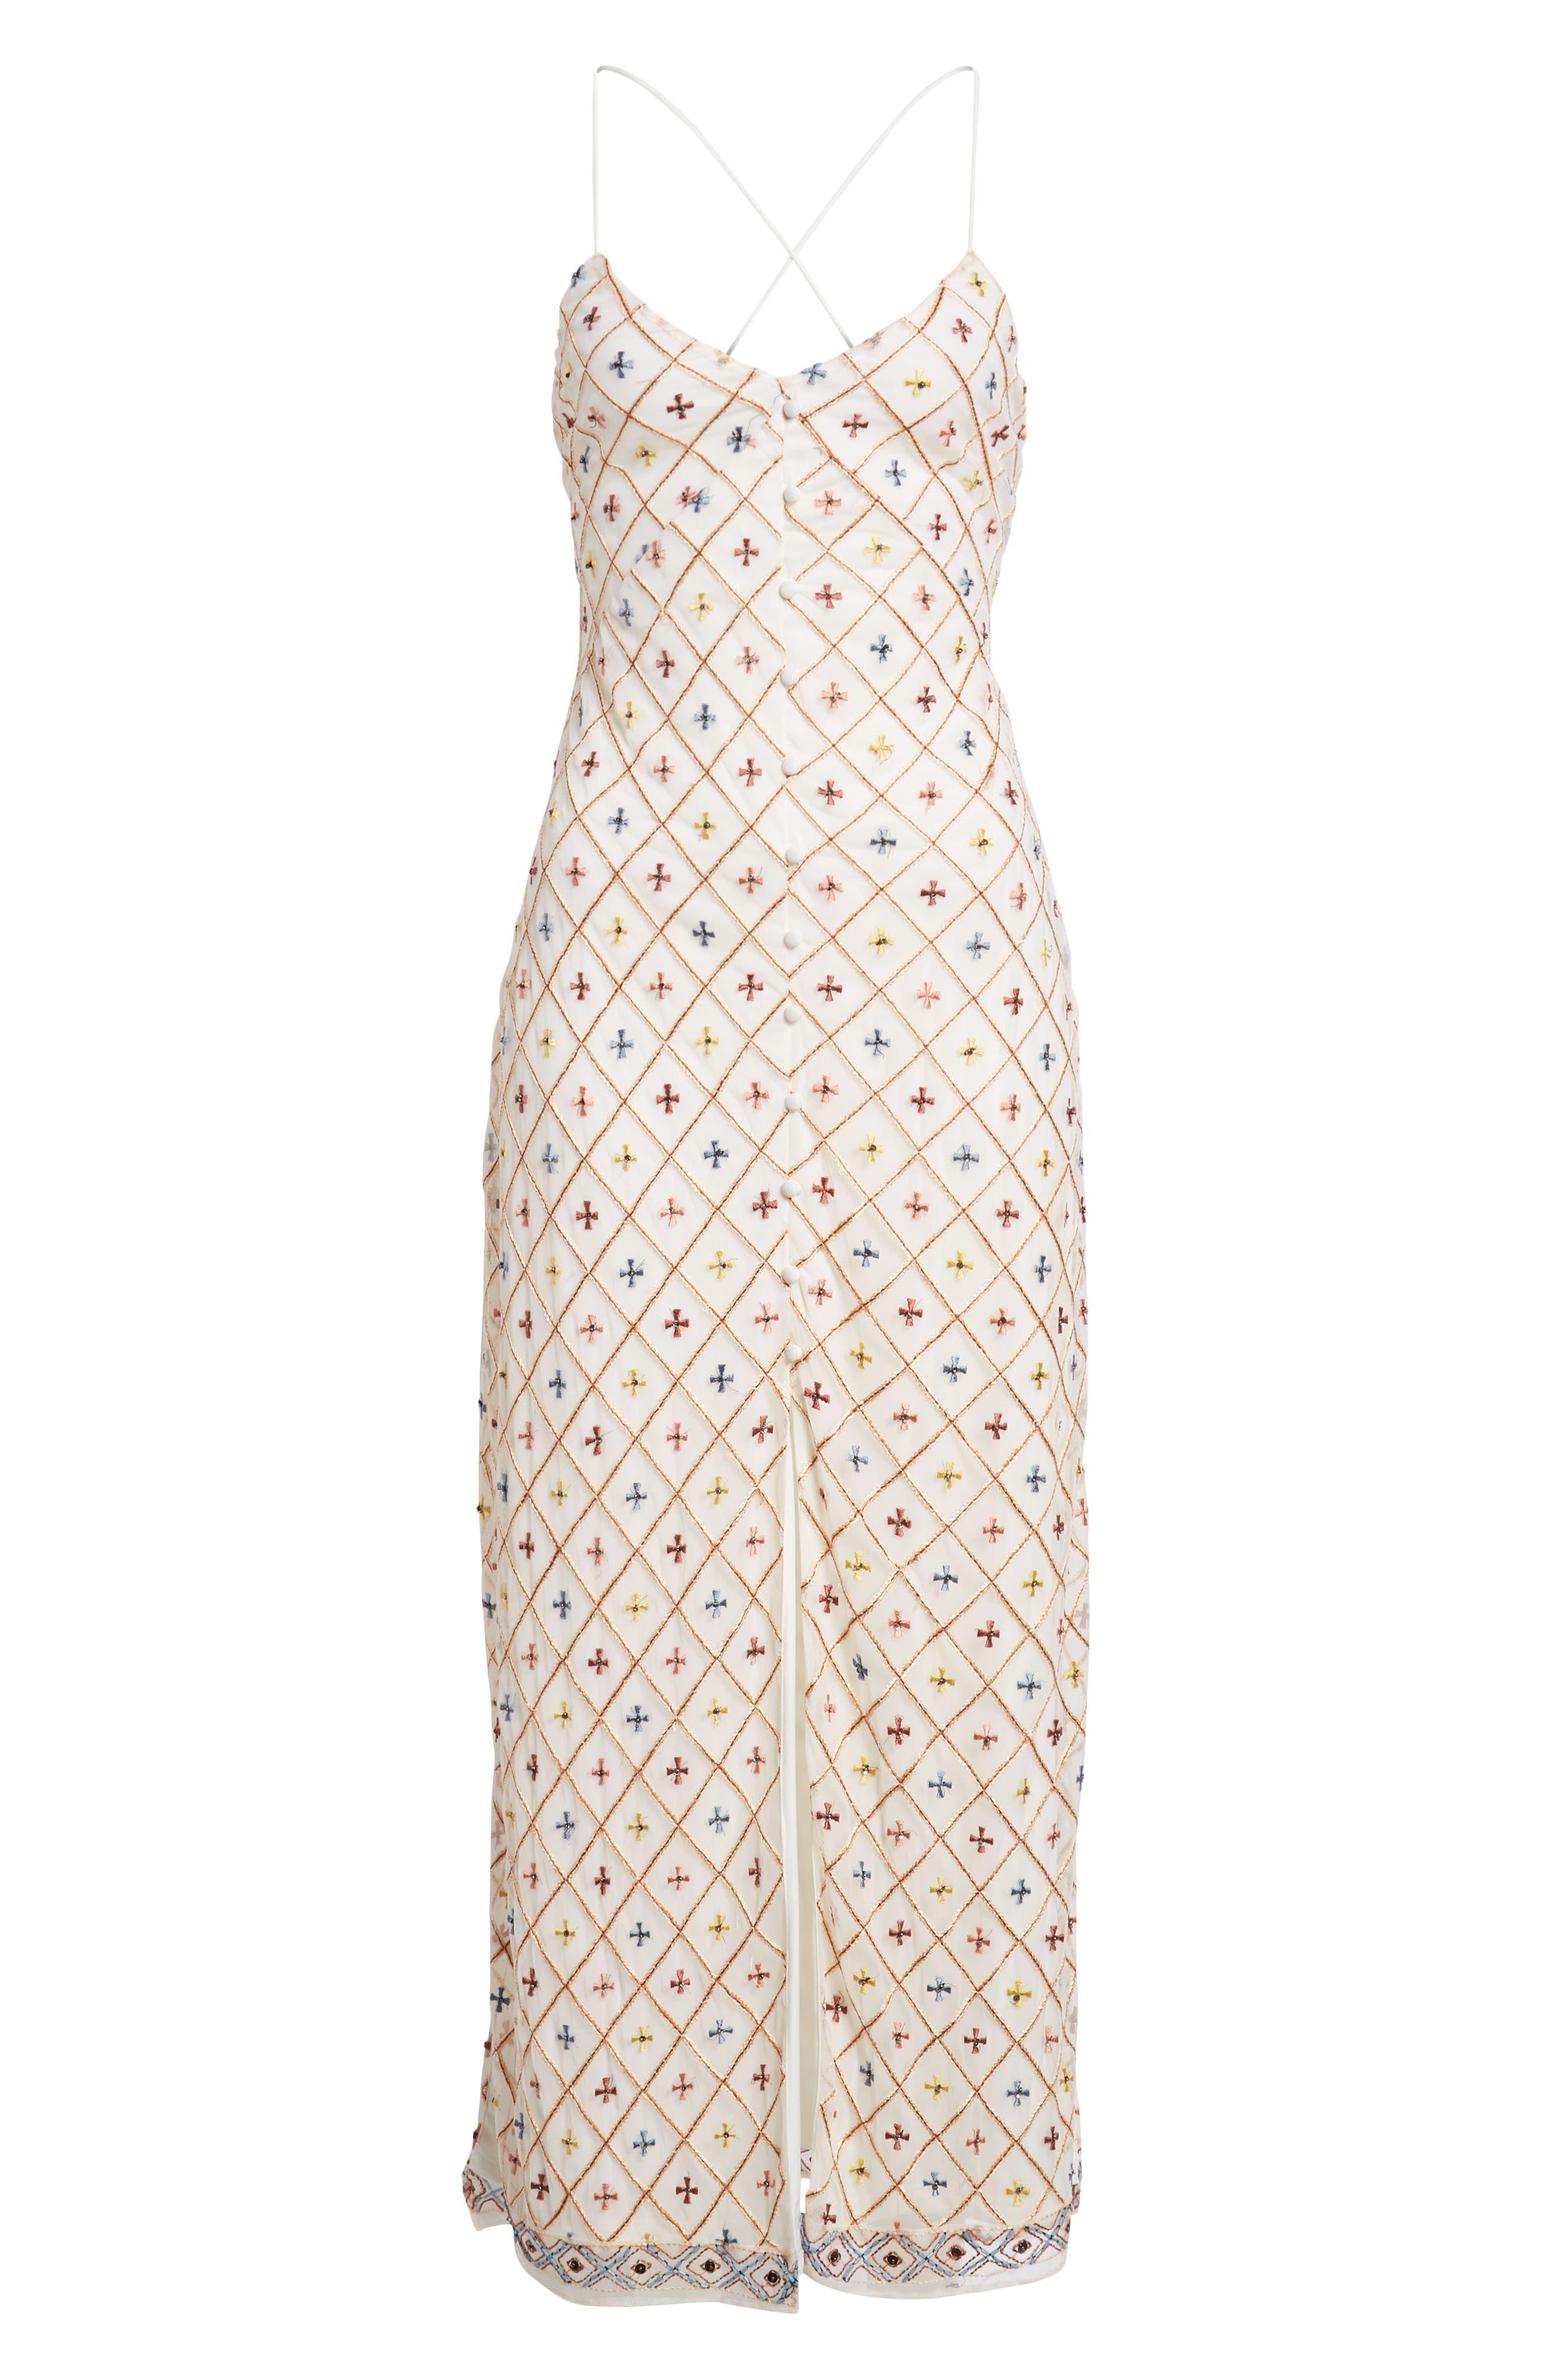 Linda Maxi Dress,                             Alternate thumbnail 7, color,                             900